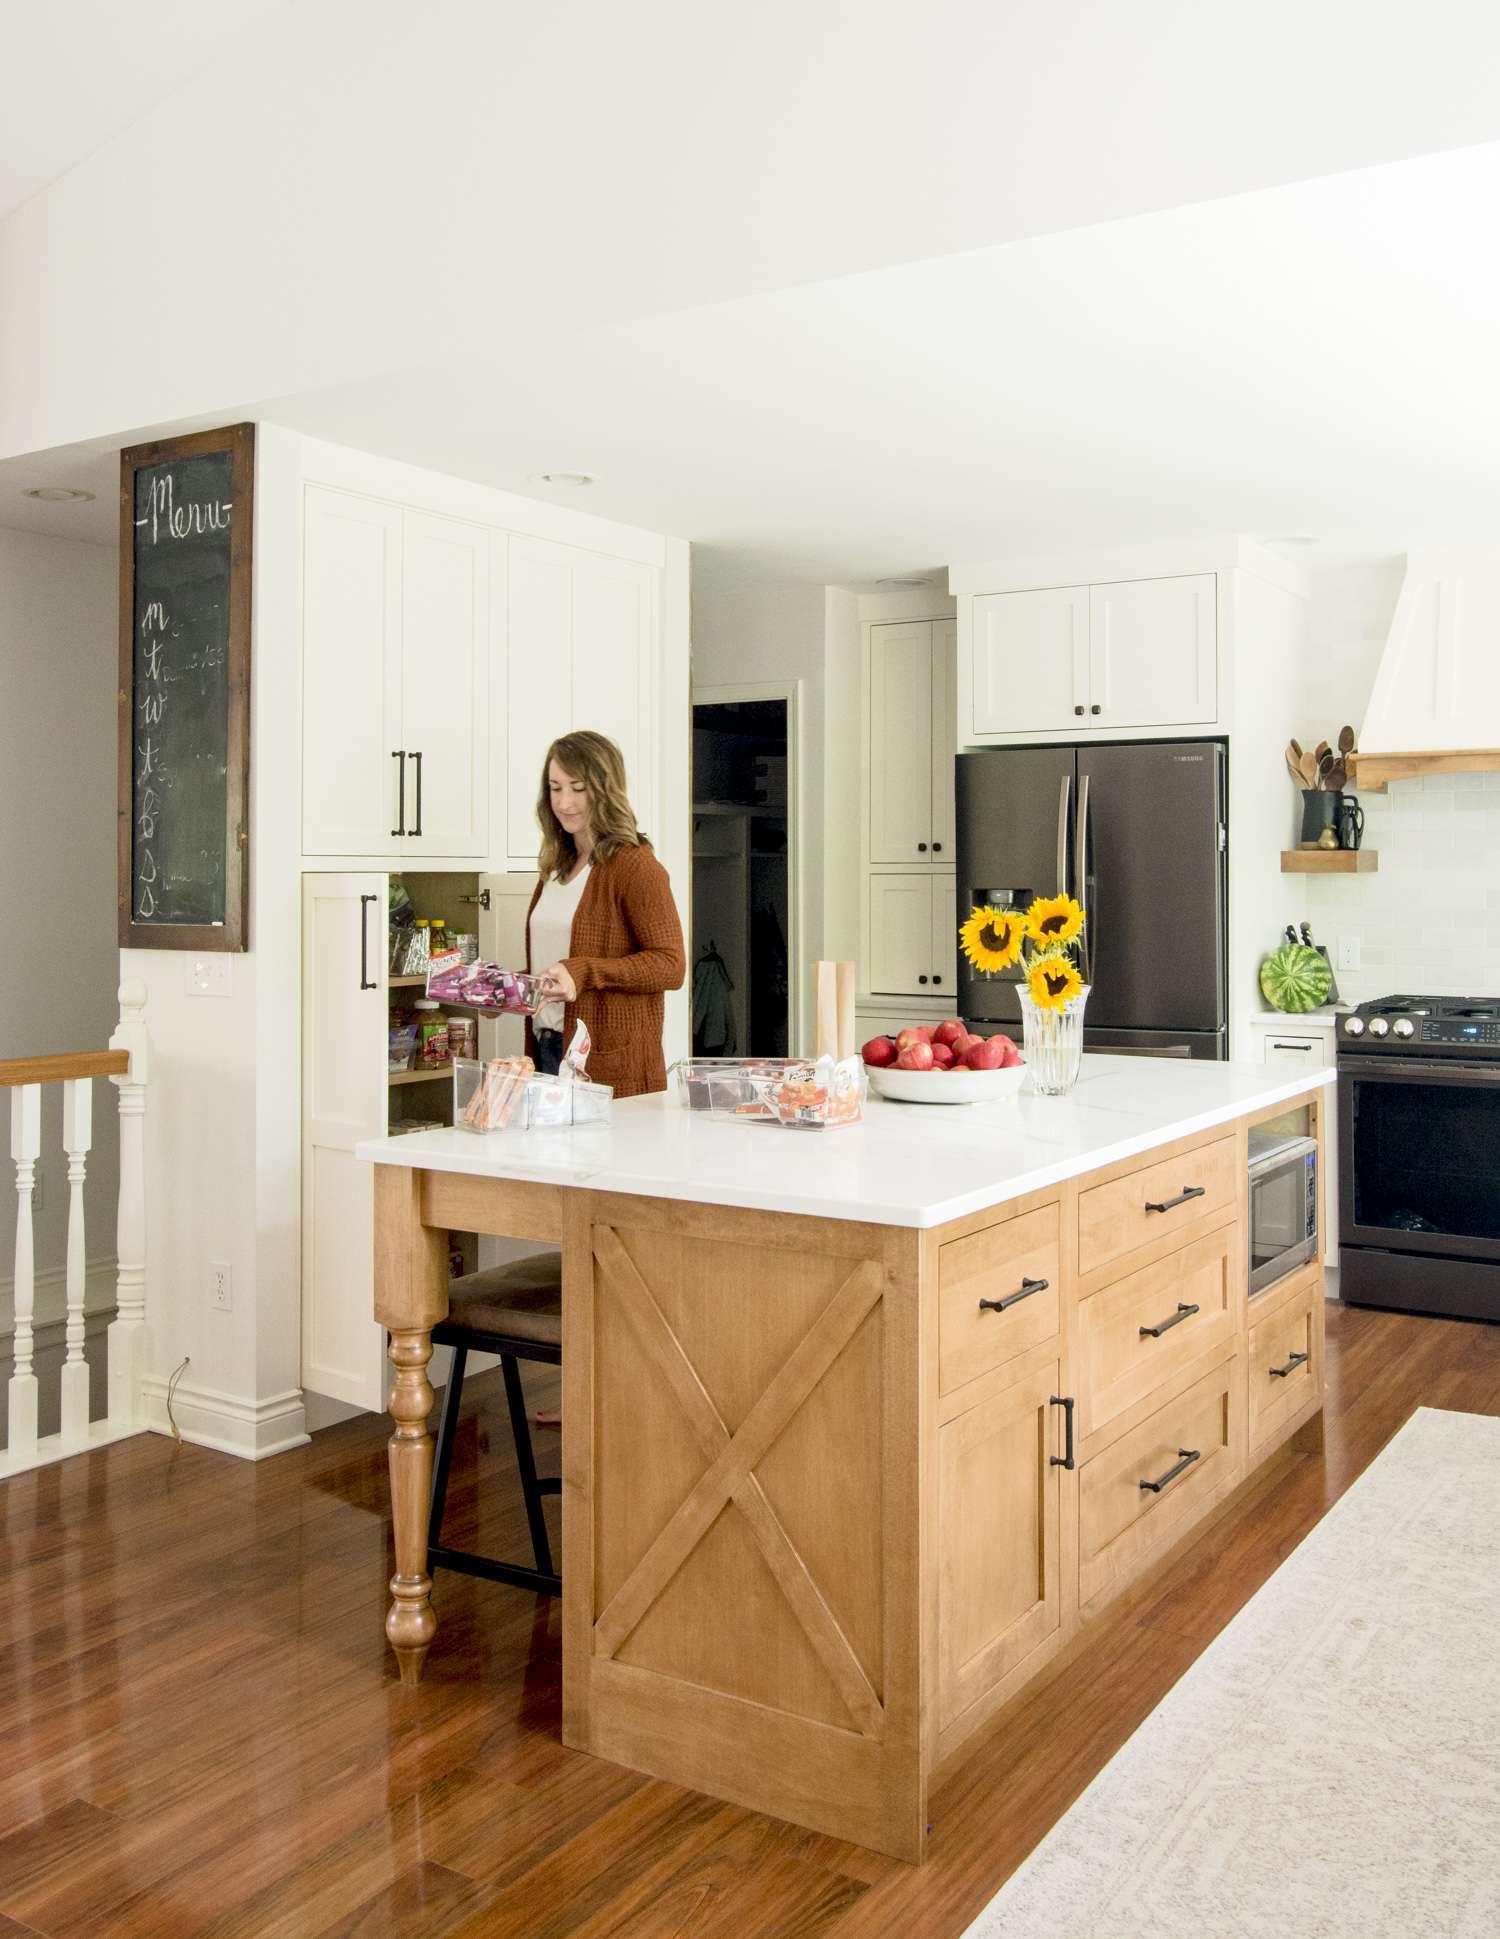 Kitchen Pantry Ideas in a modern farmhouse kitchen